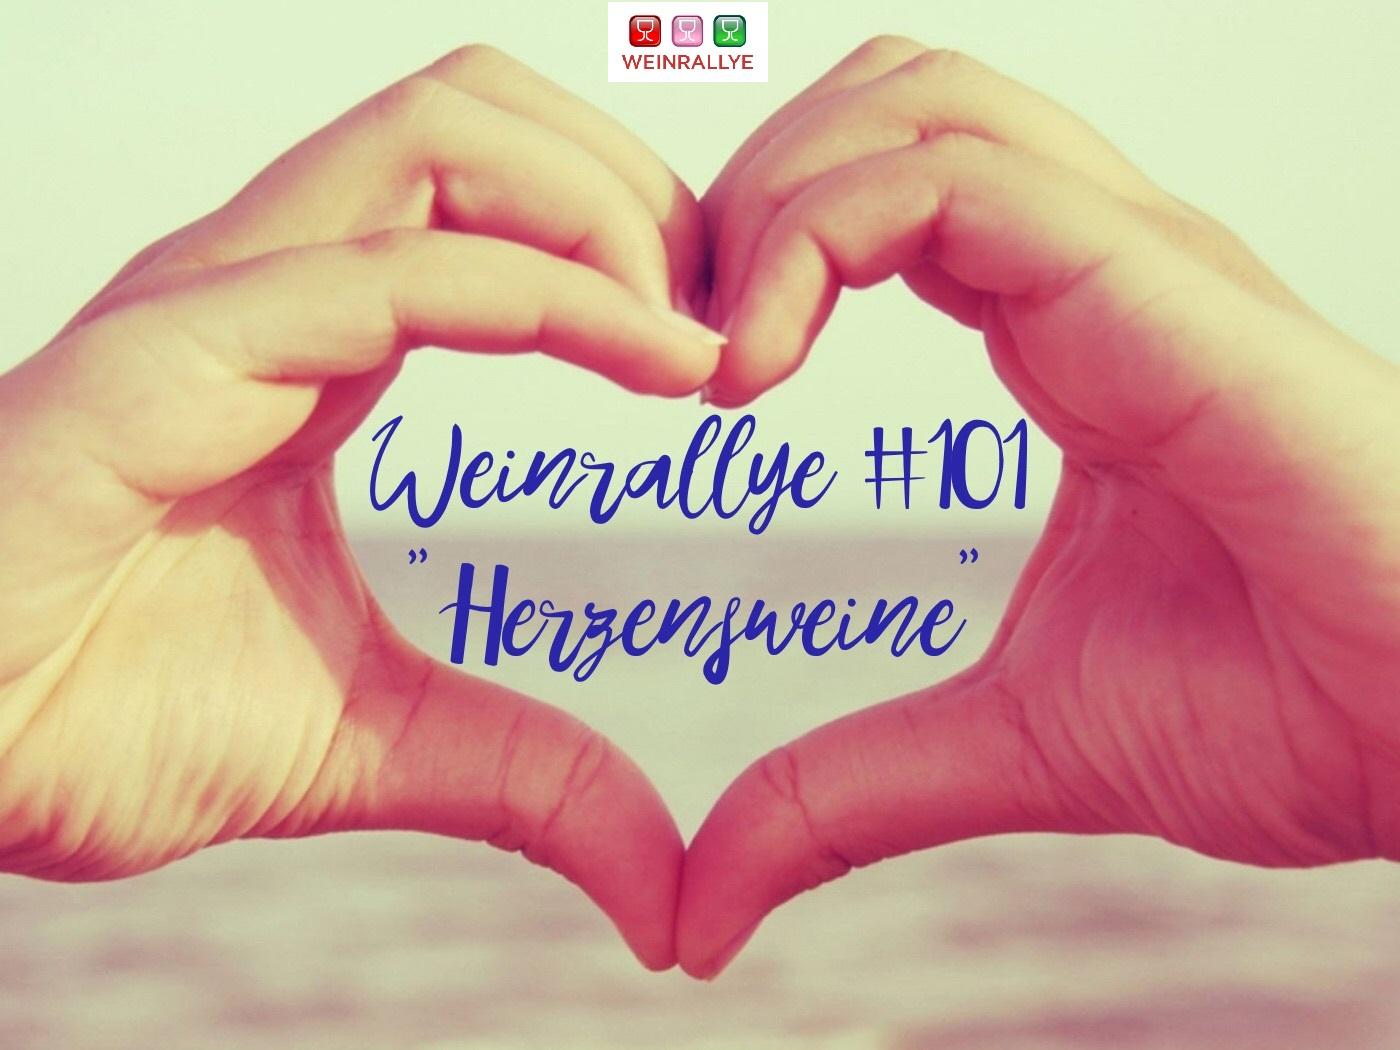 Weinrallye 101